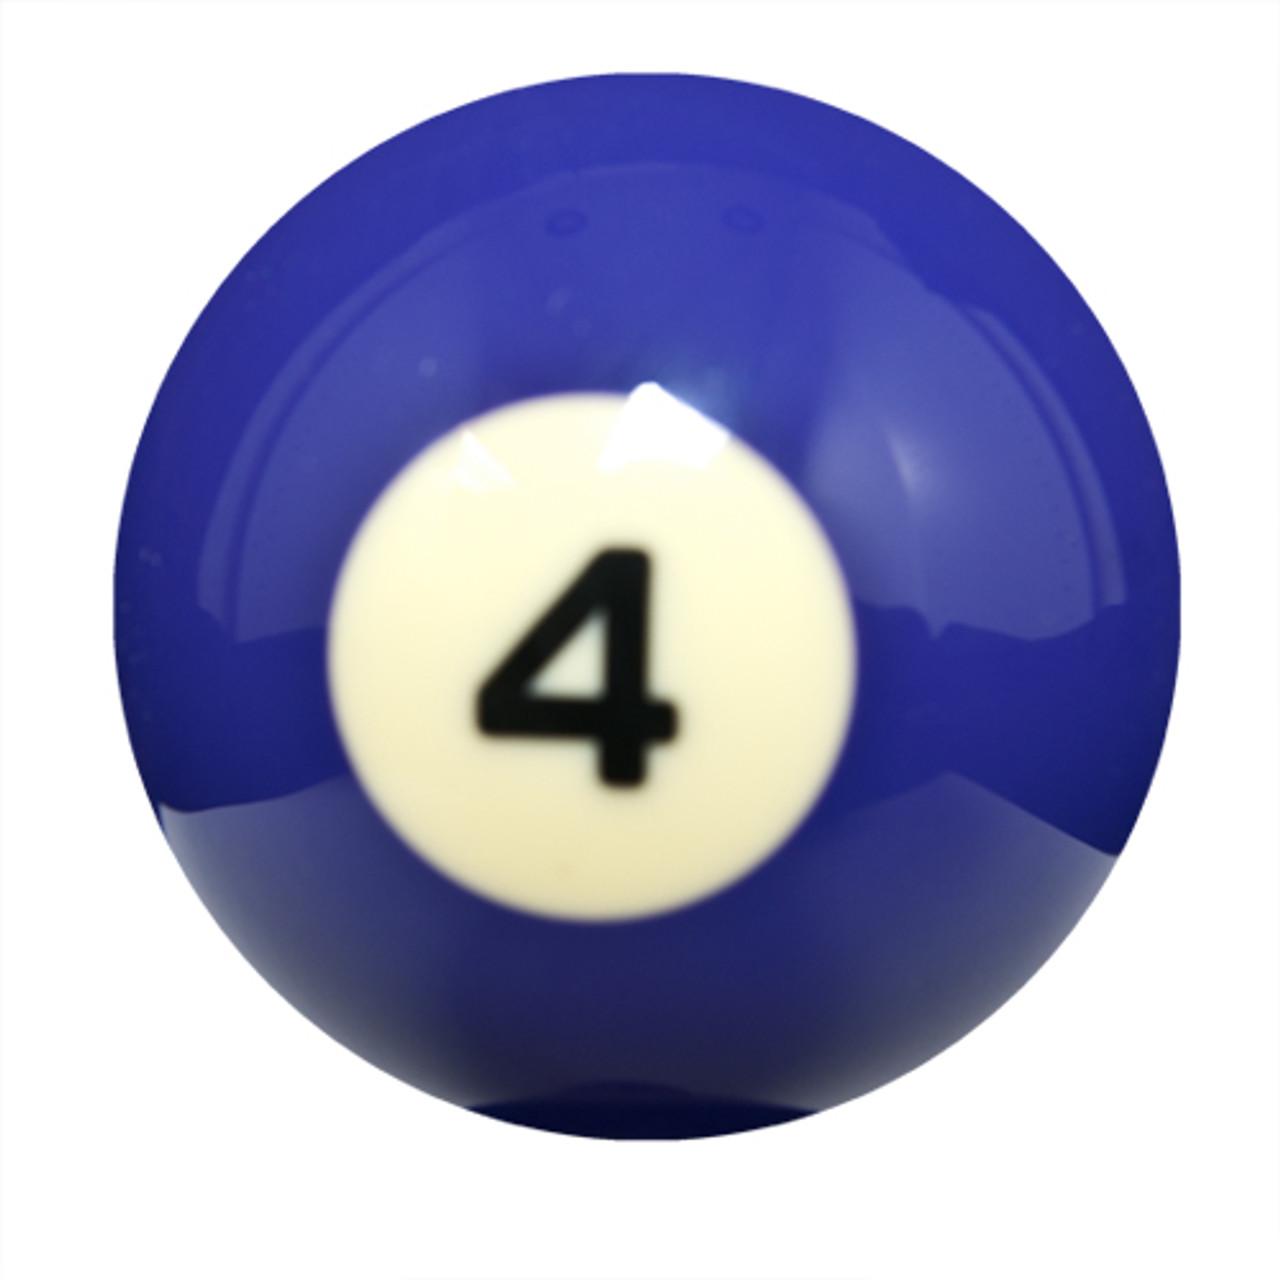 Sterling Replacement Billiard Balls #4